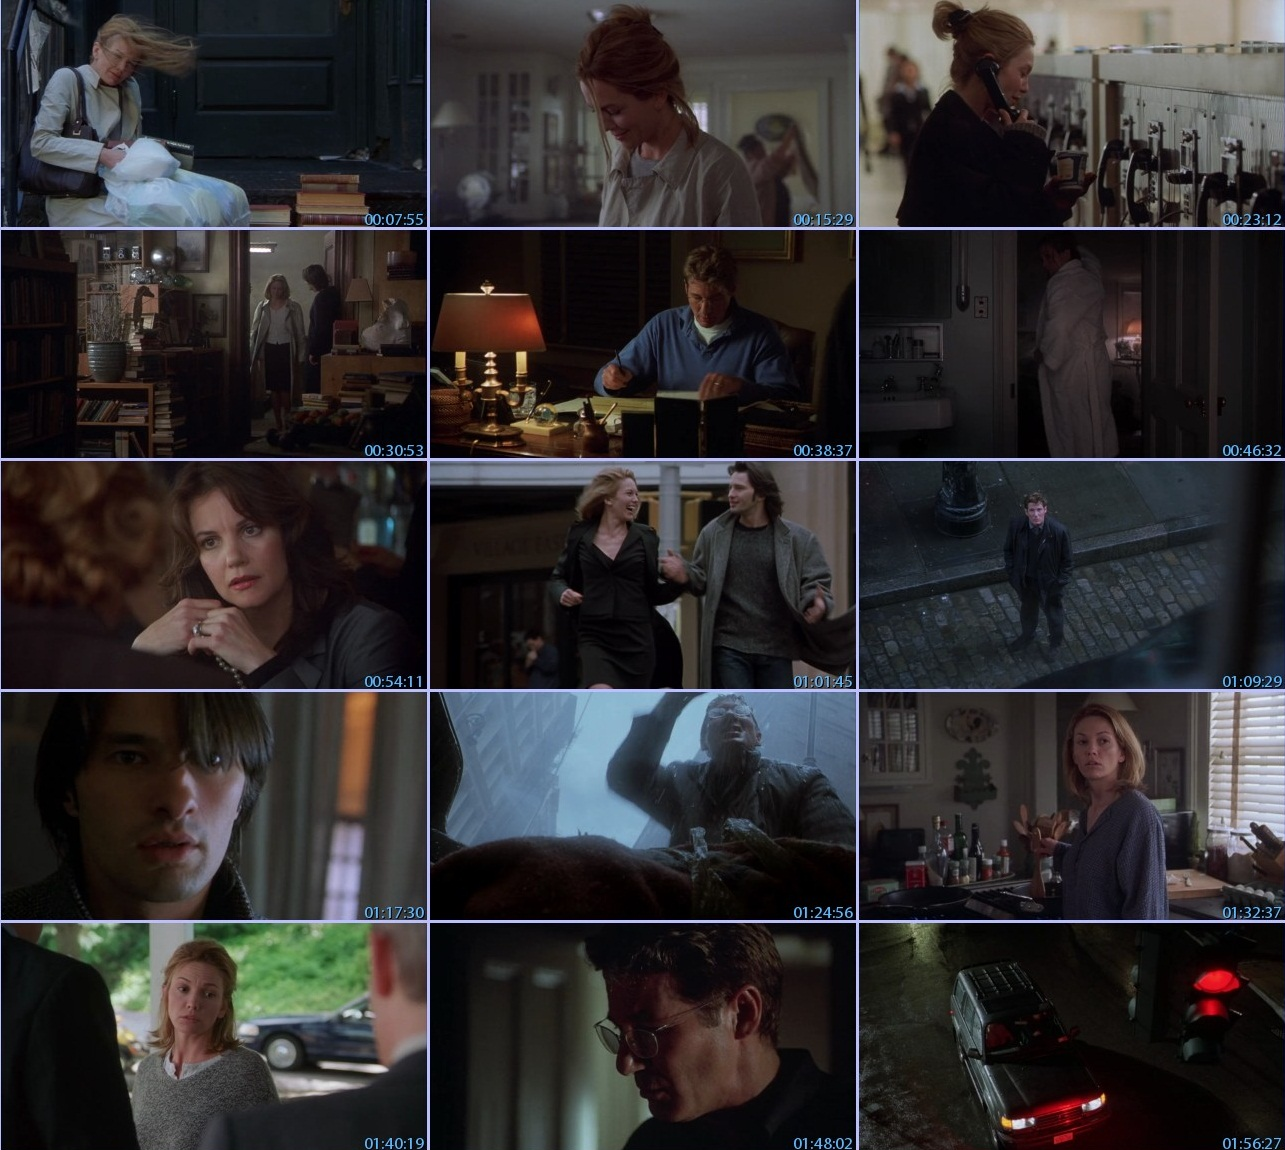 http://1.bp.blogspot.com/-Ci2r5KZtHOY/UVPcEln3riI/AAAAAAAAU1w/hc_5wWIL12s/s1600/Unfaithful+BluRay+720p+Screen.jpg